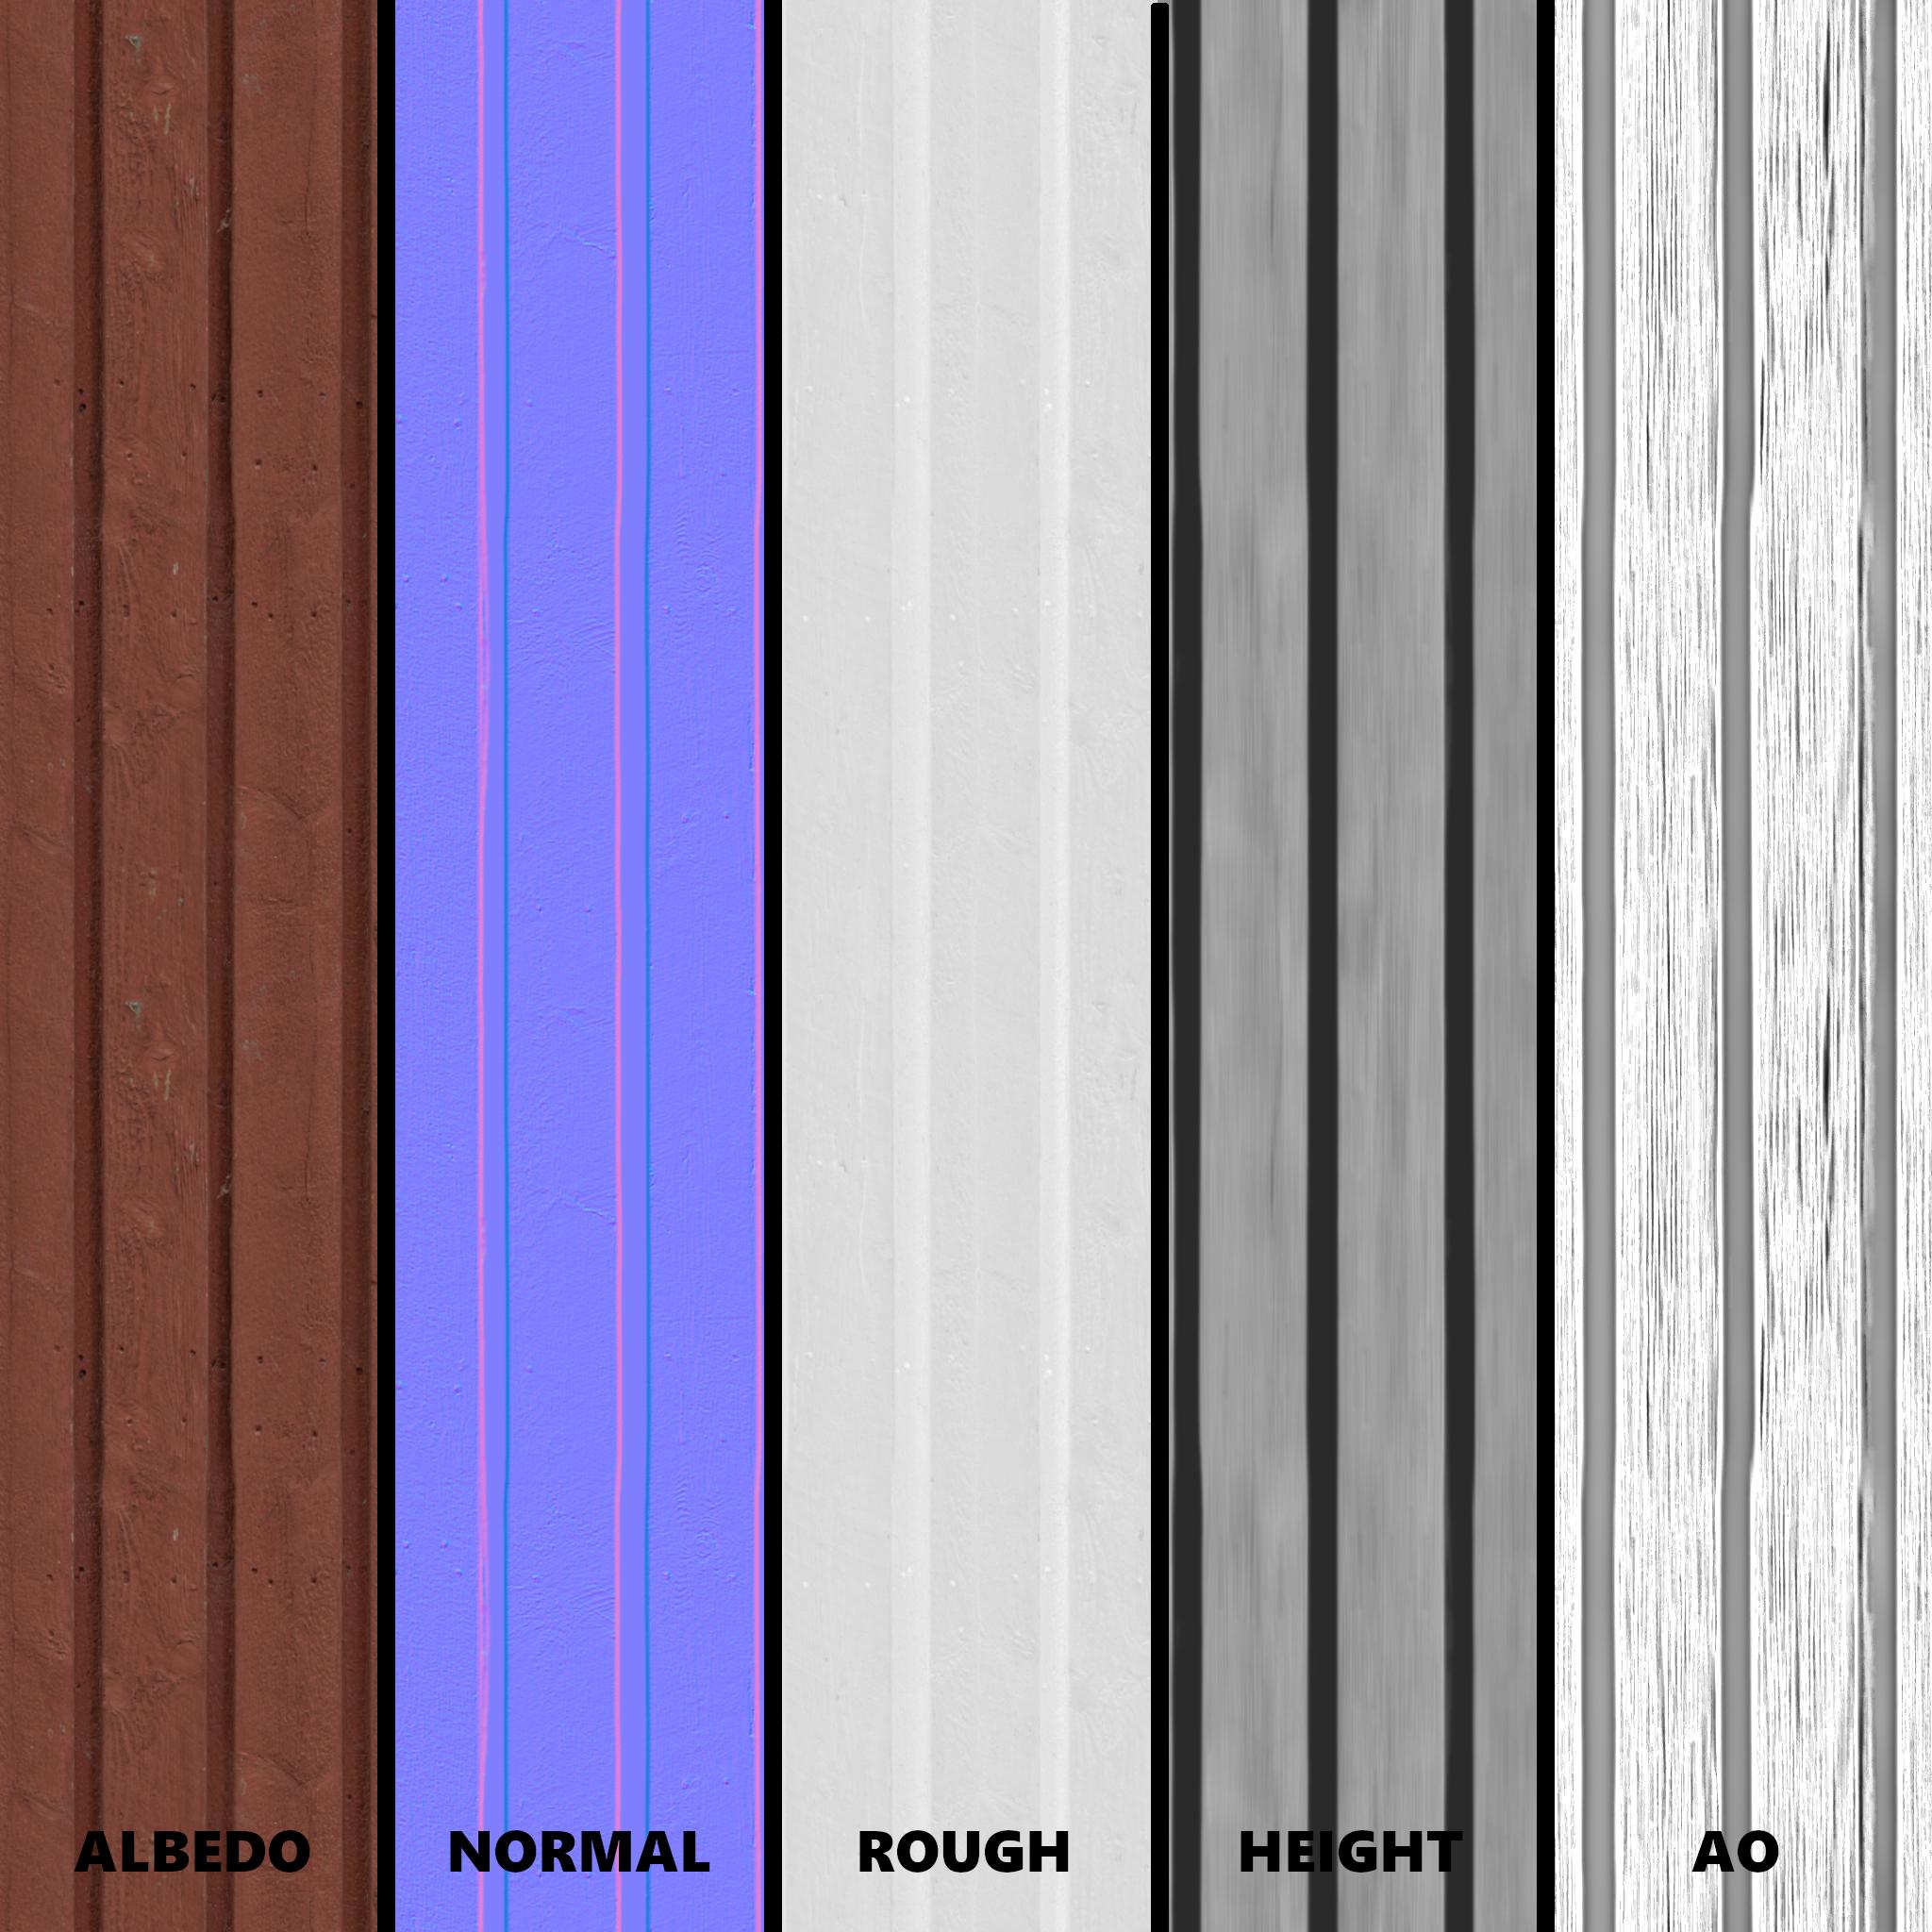 Wall planks (photogrammetry)